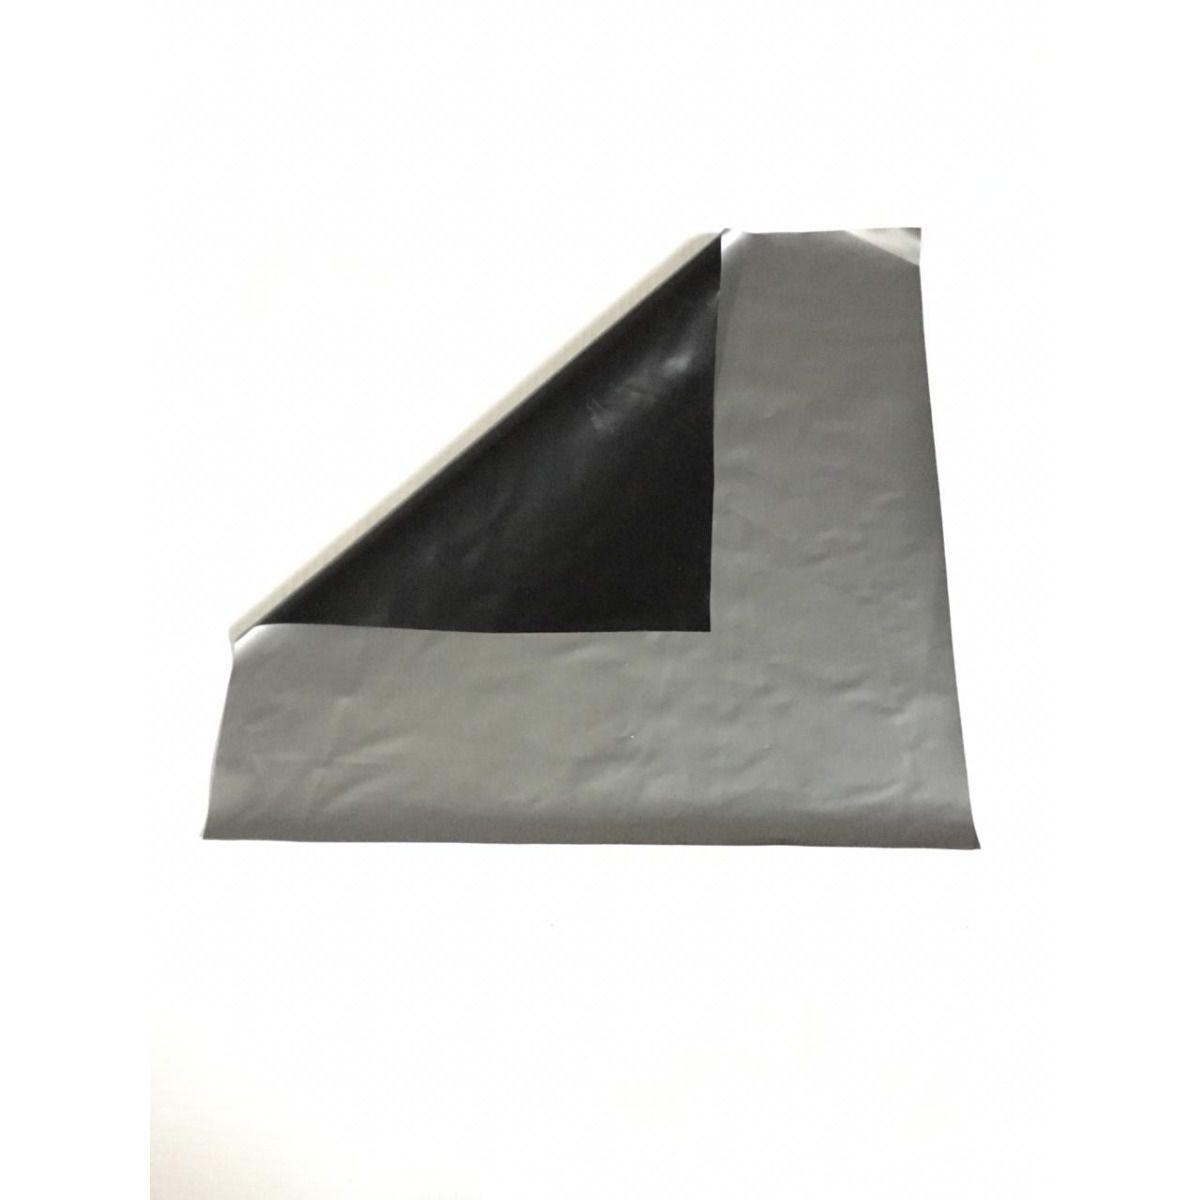 Lona Para Silagem Dupla Face Prata/Preta 30x12 Aprox 150 Mic